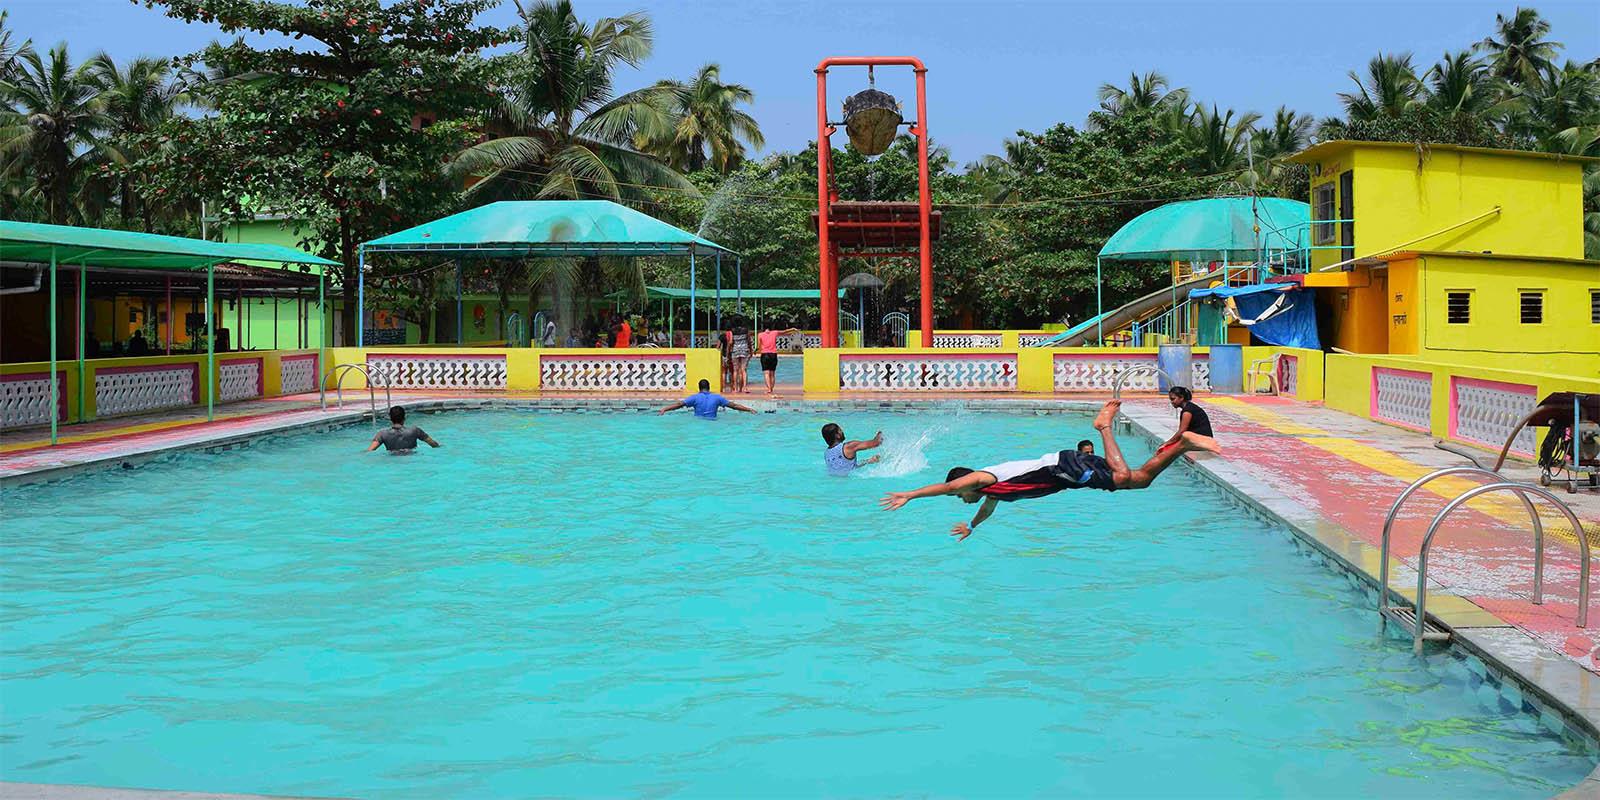 Arnala Beach Resort Virar Entry Fees